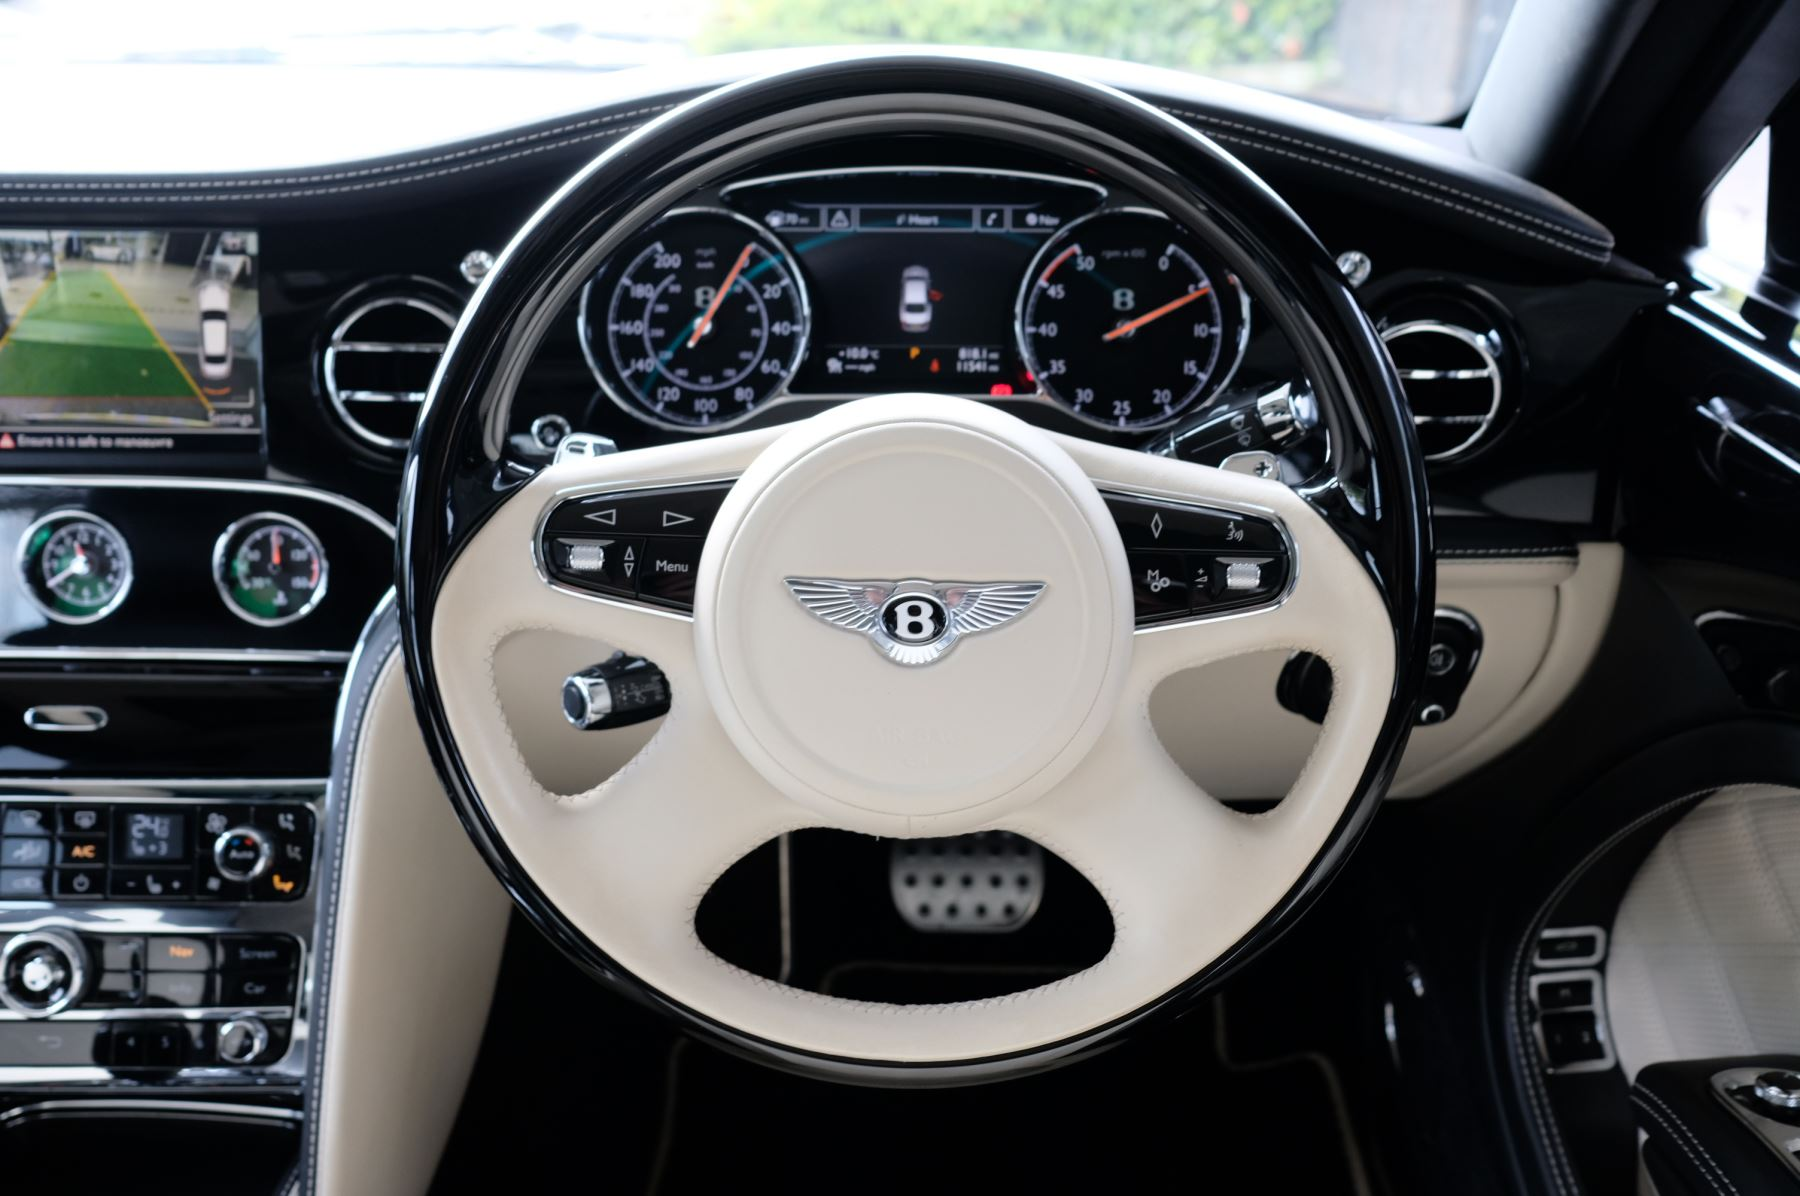 Bentley Mulsanne 6.8 V8 Speed image 15